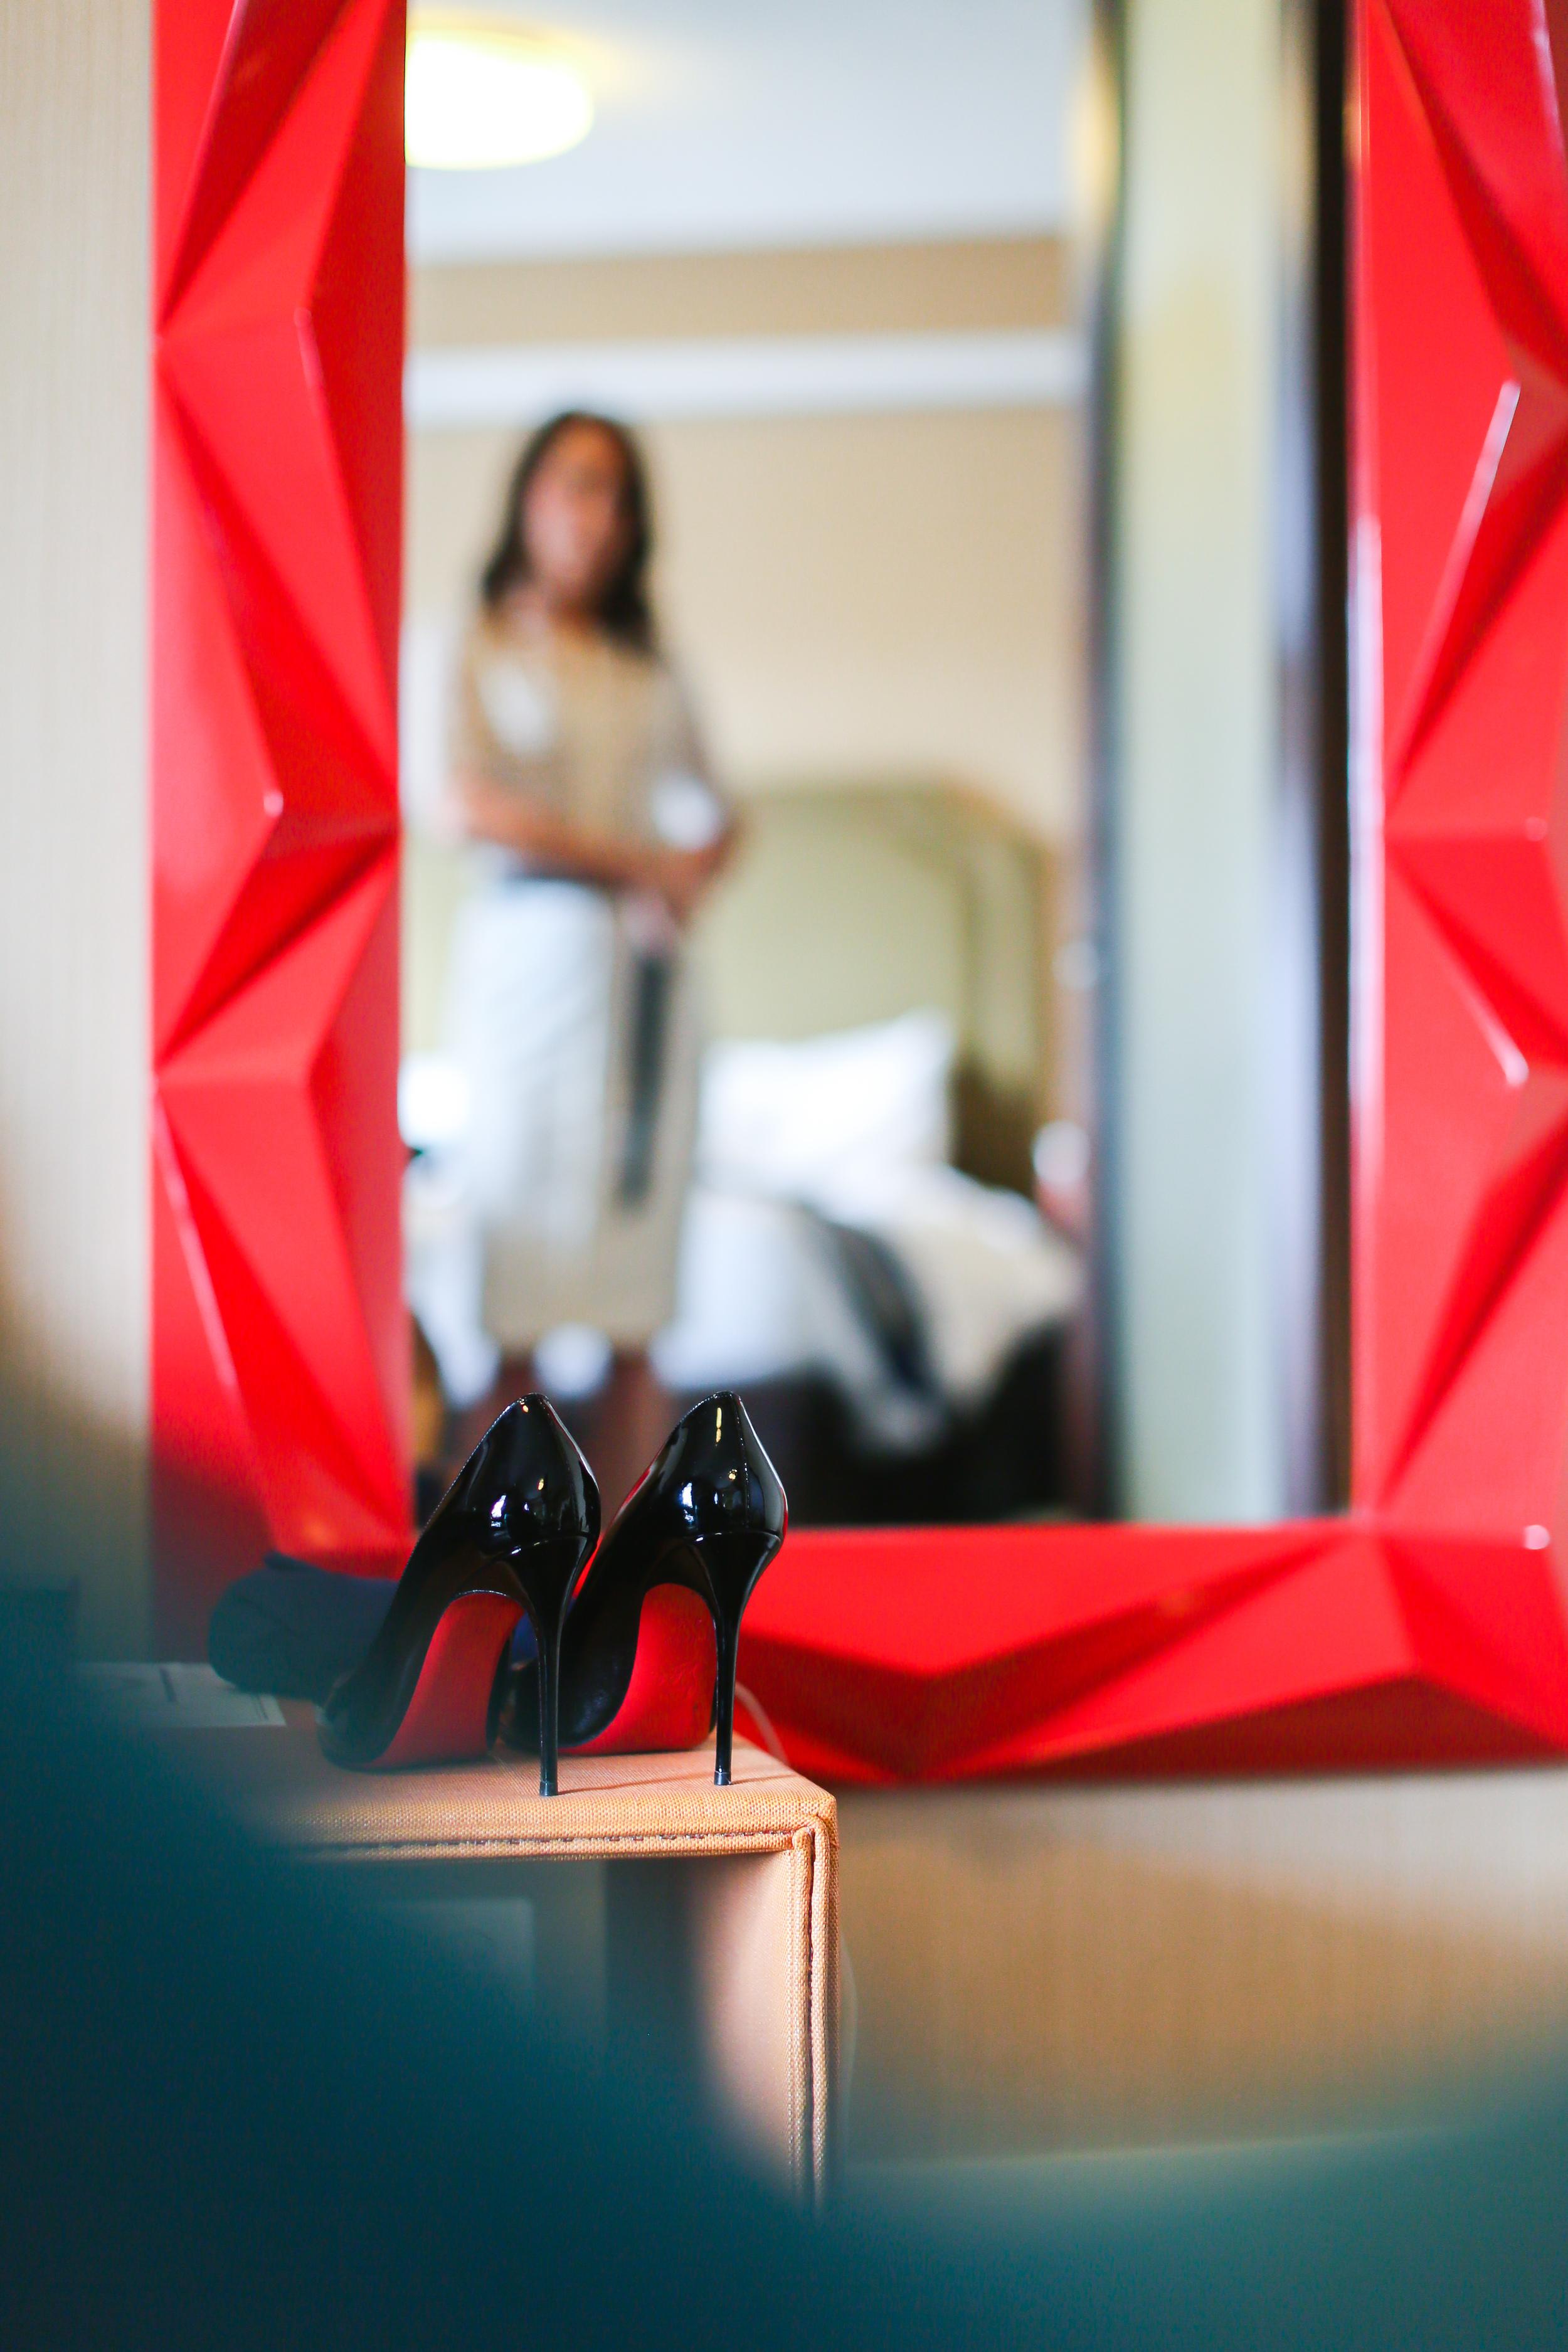 red louboutin heels mirror